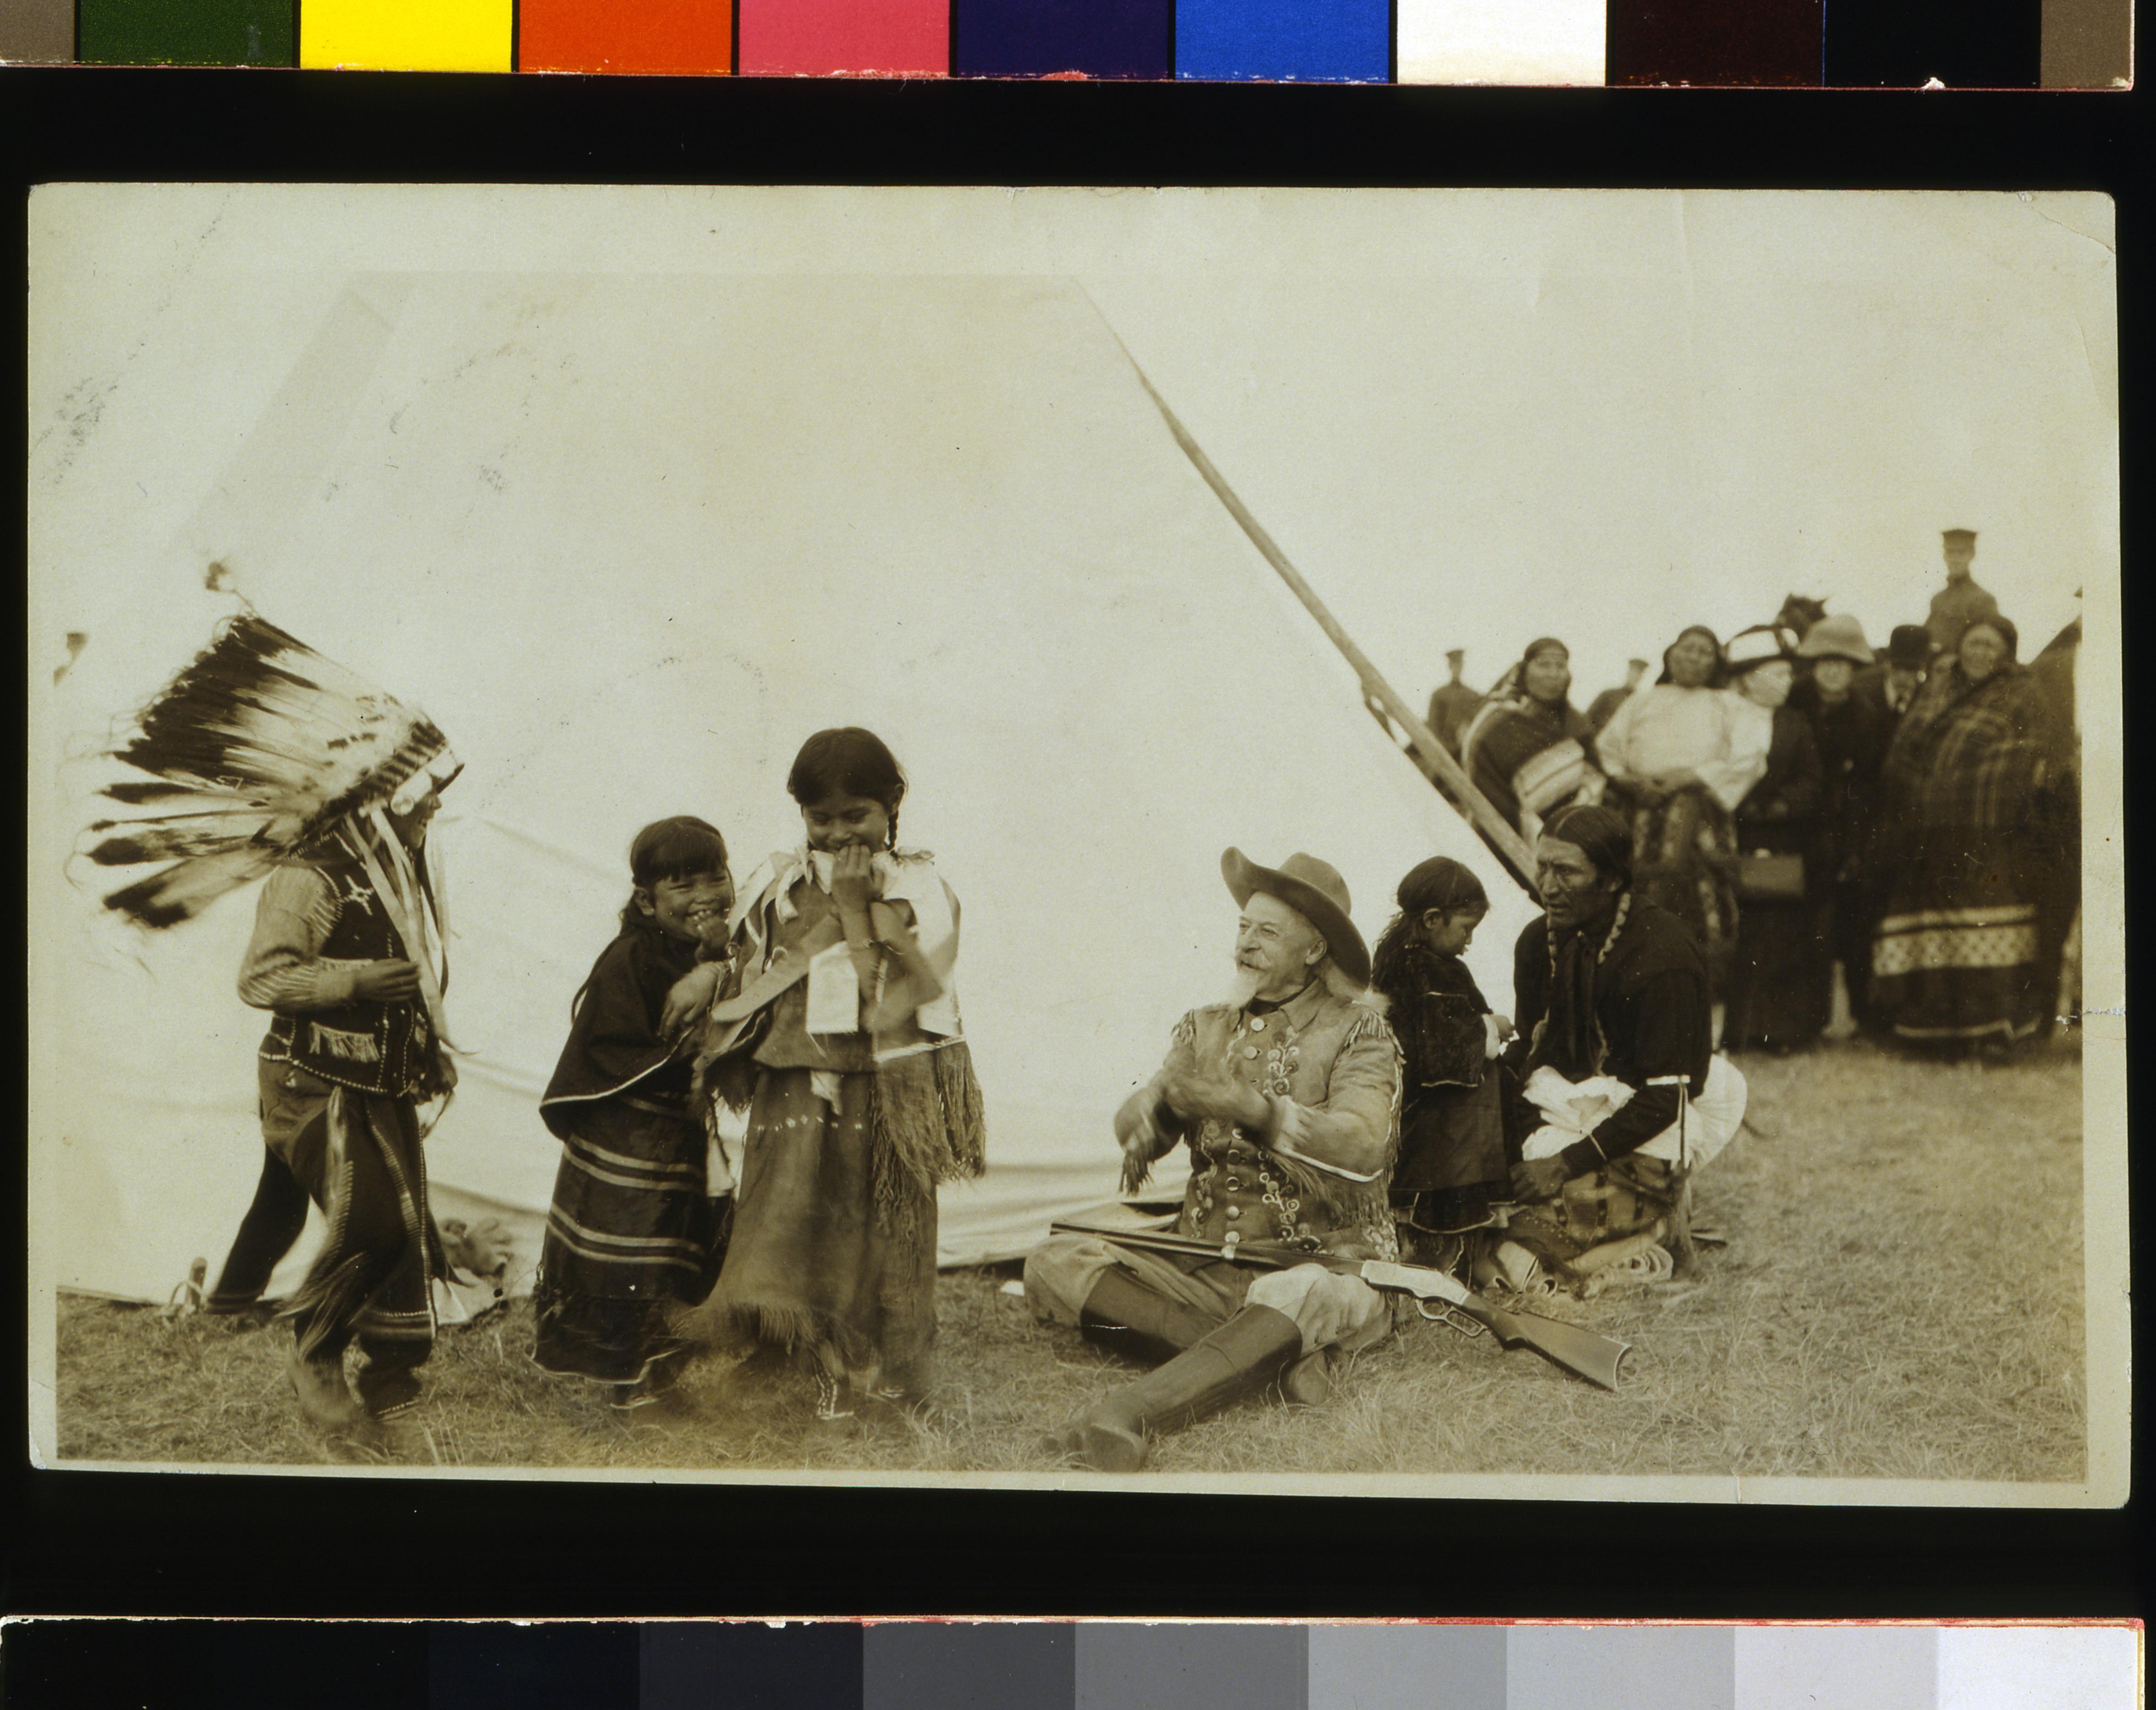 Plains Indian Children With Buffalo Bill